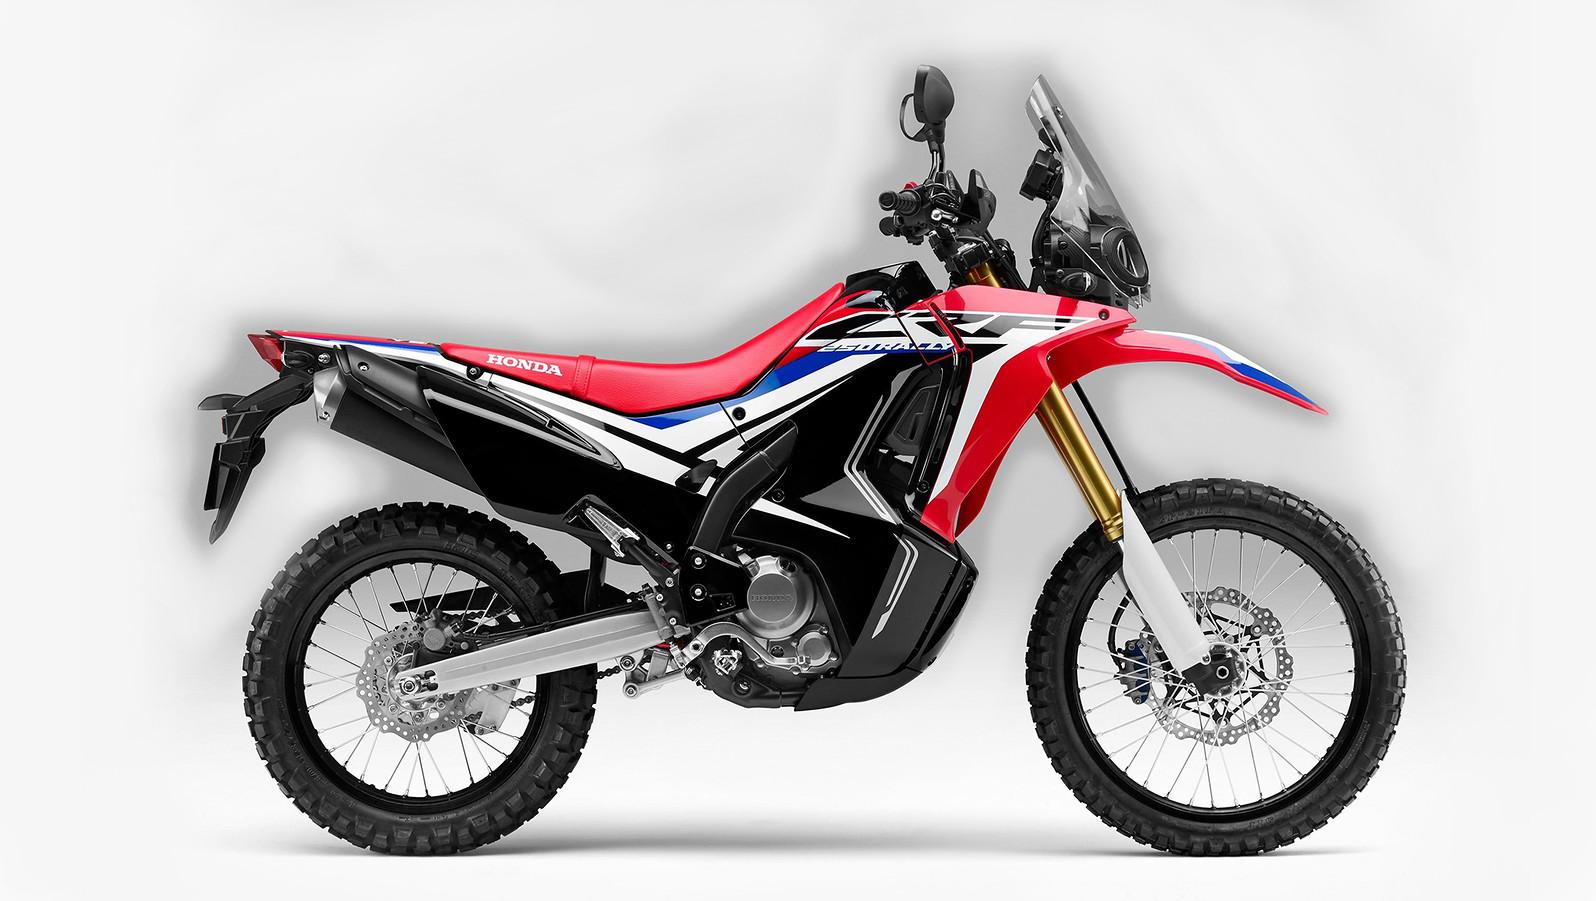 2017 Honda CRF250L Standard and Rally  2017 Honda CRF250L Standard and Rally